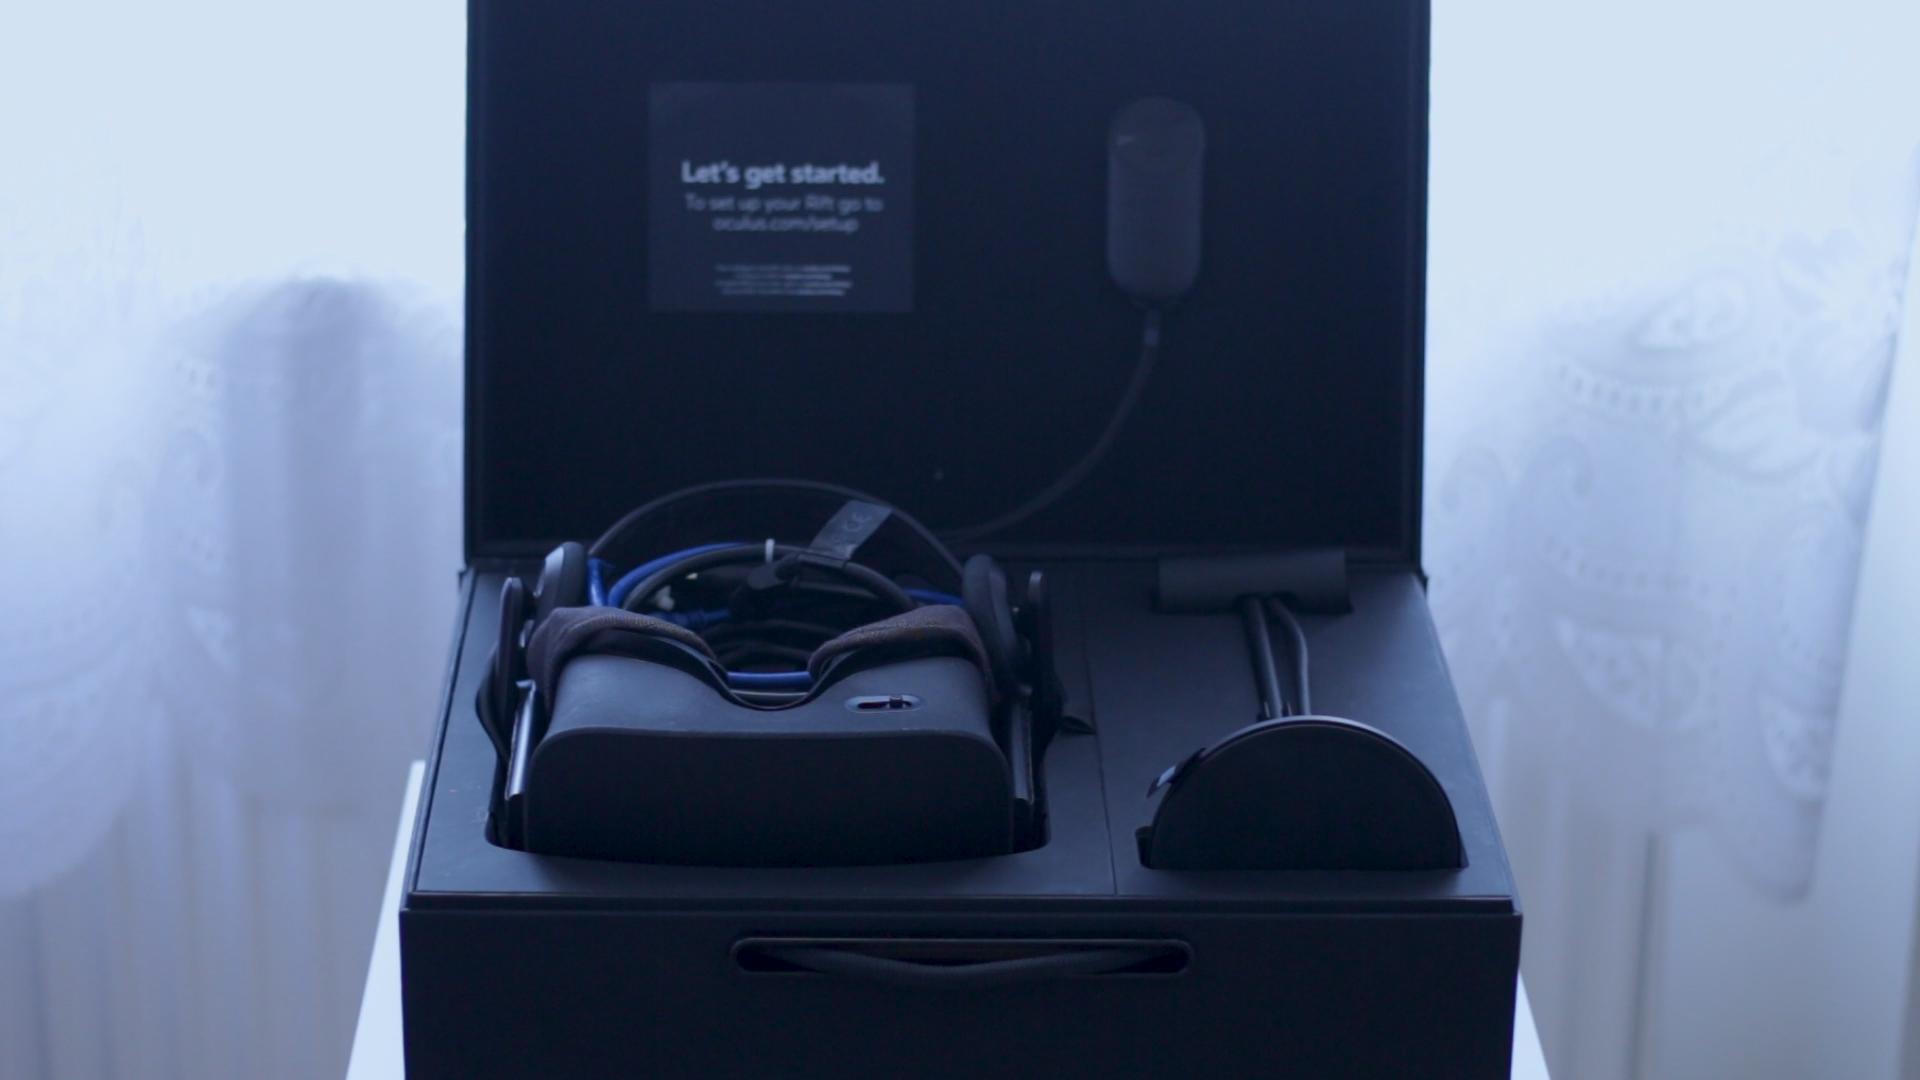 Holoszoba Oculus Rift CV1 Körkép